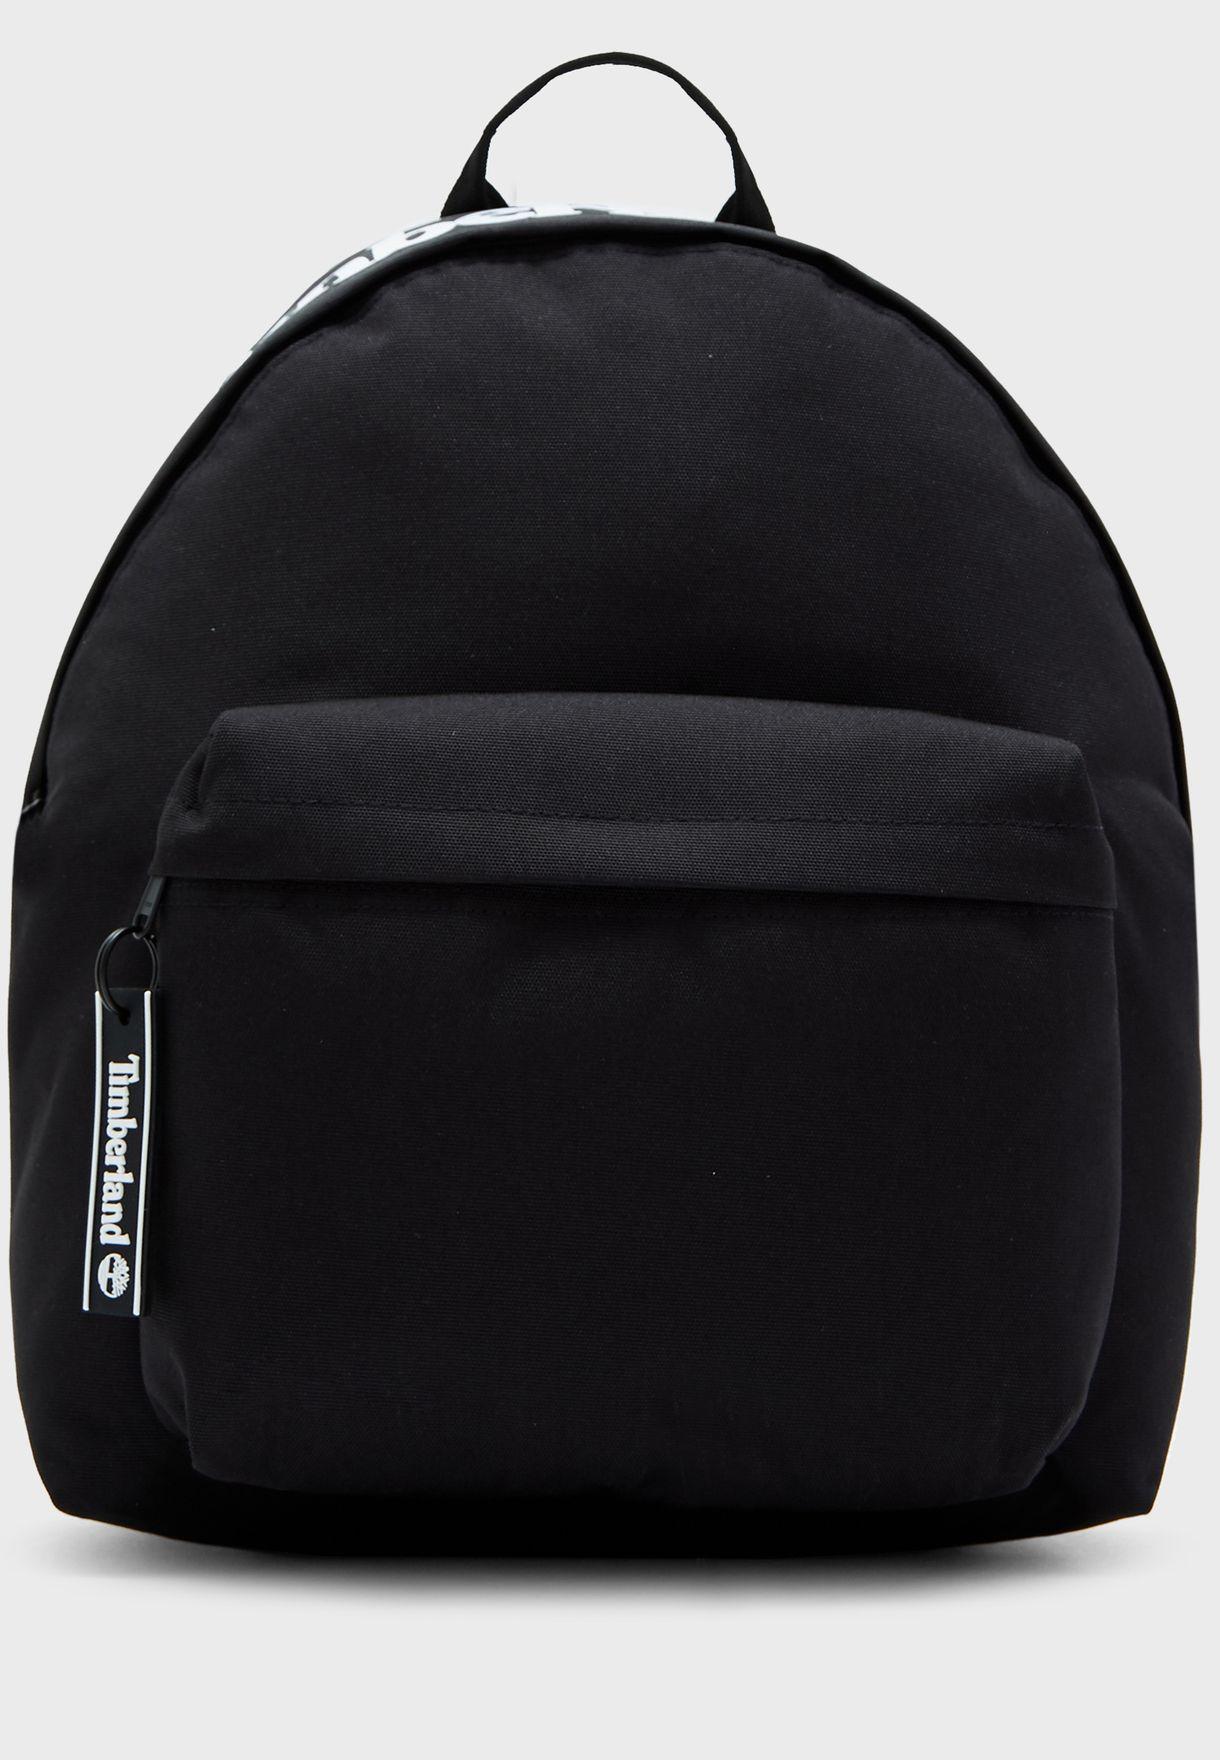 900D Solid Backpack